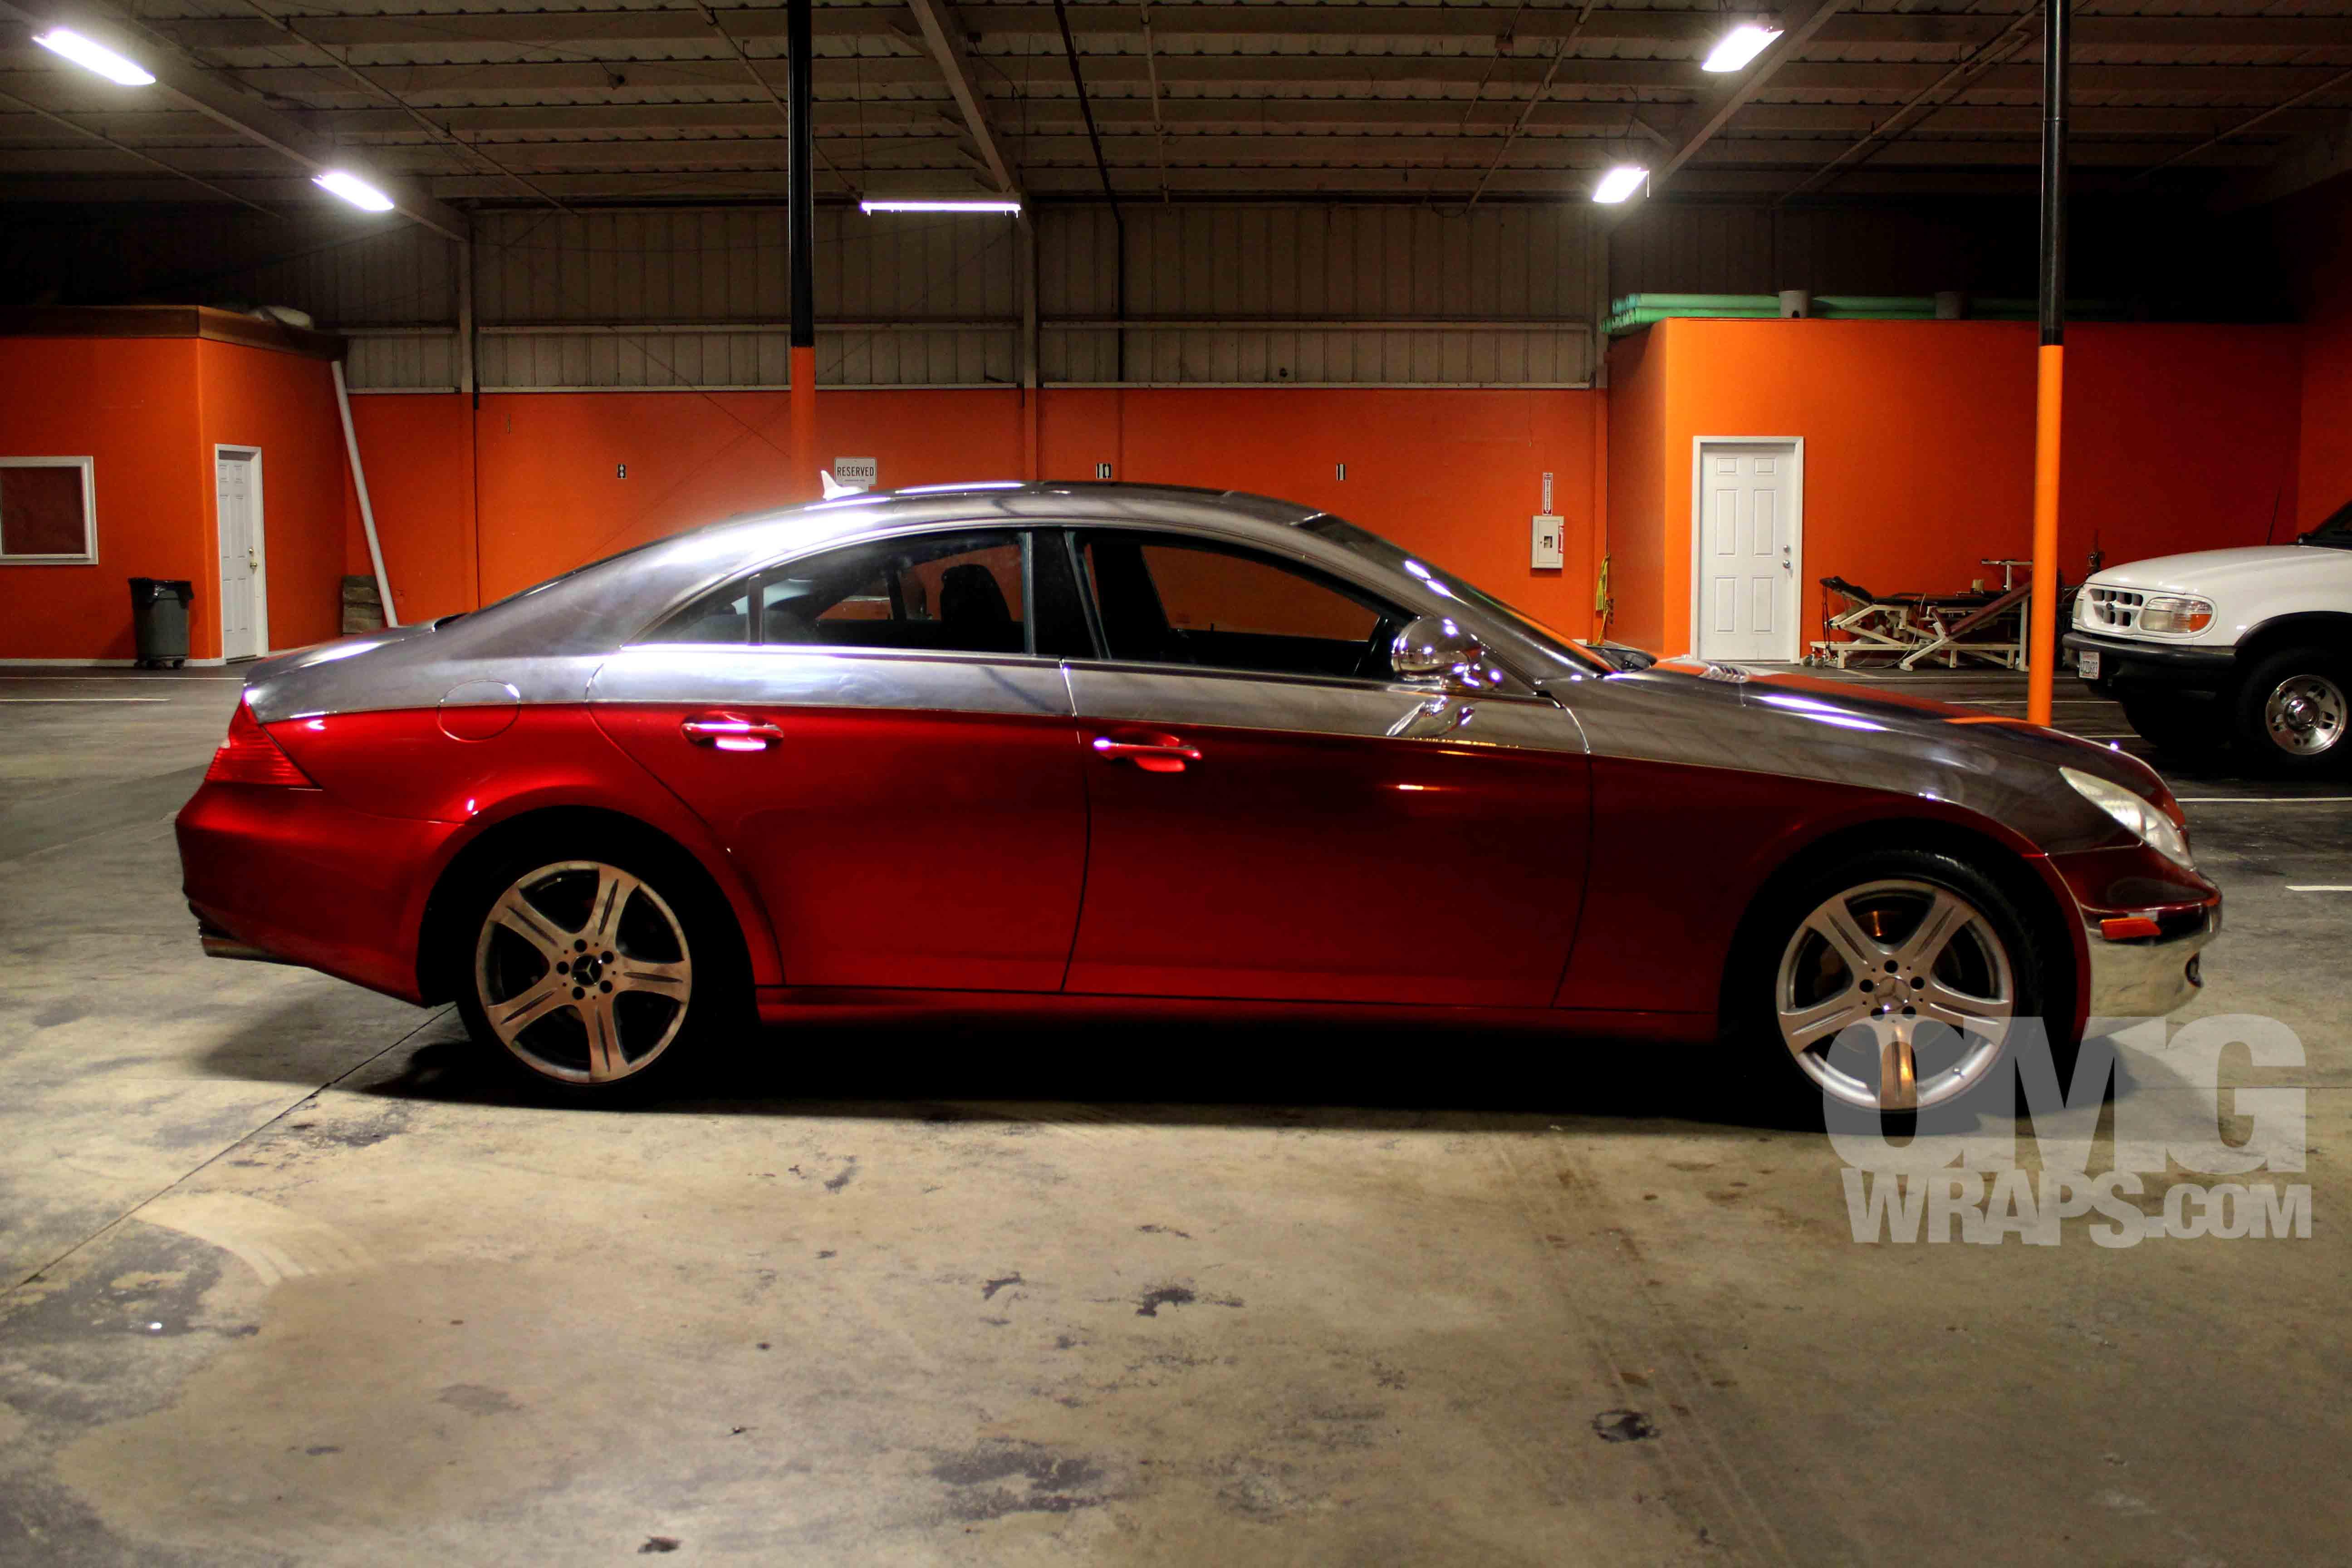 Mercedes Benz Of Oakland >> Custom Chrome Vehicle Wrap | Car Wraps In San Francisco, Sacramento and Los Angeles